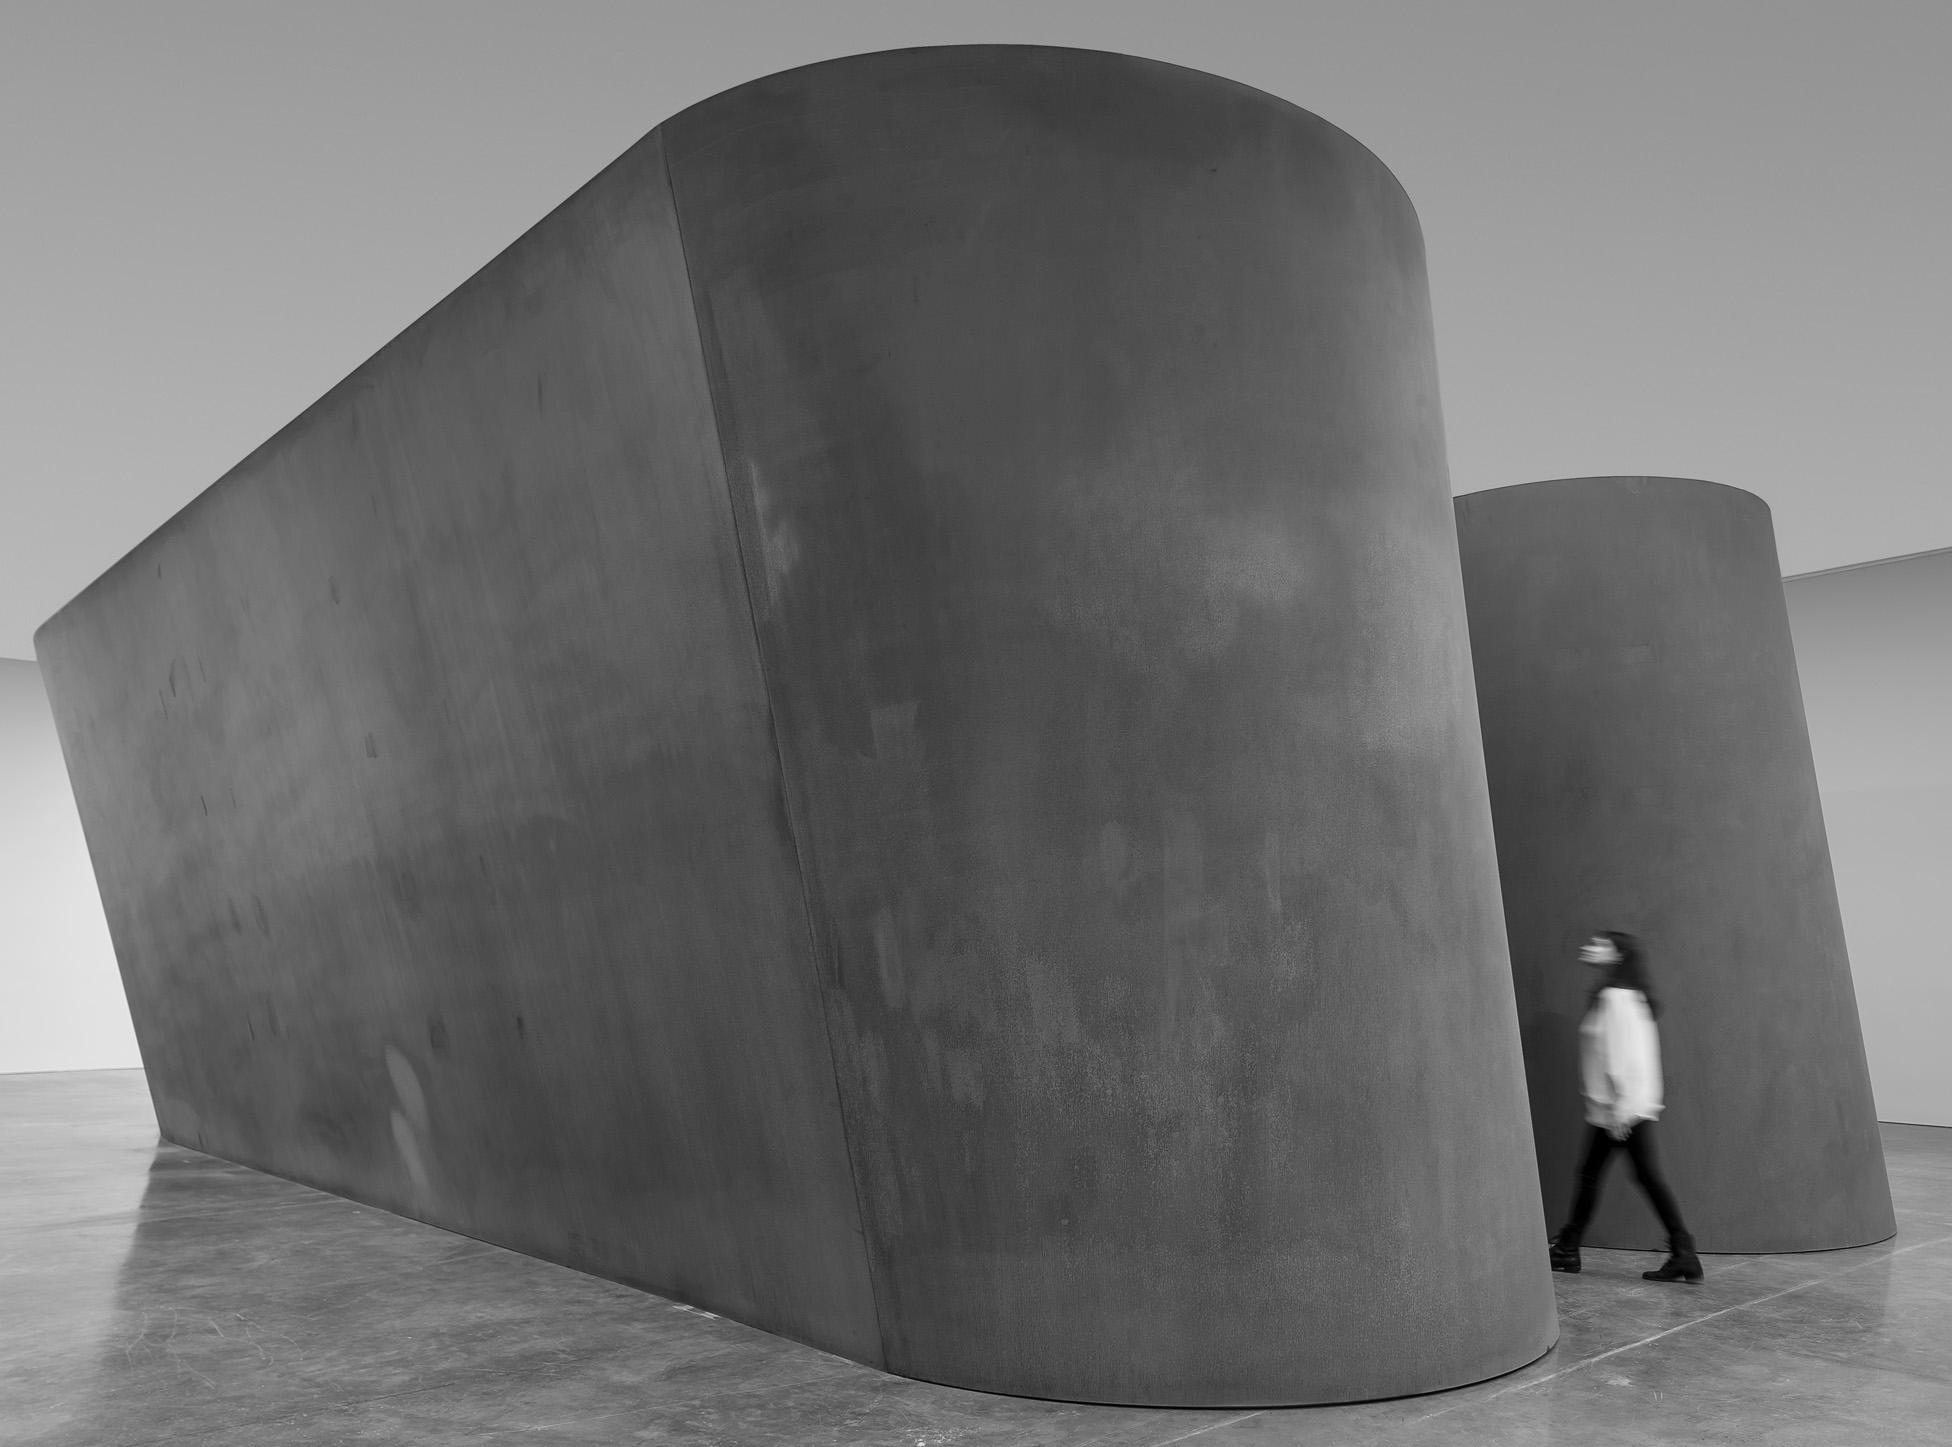 "RICHARD SERRA NJ-1, 2015 Weatherproof steel Six plates Overall: 13' 9"" x 51' 6""x 24' 6"" (4.2 x 15.7 x 7.5 m) Plates: 2"" (5 cm thick) © Richard Serra. Photograph by Cristiano Mascaro."